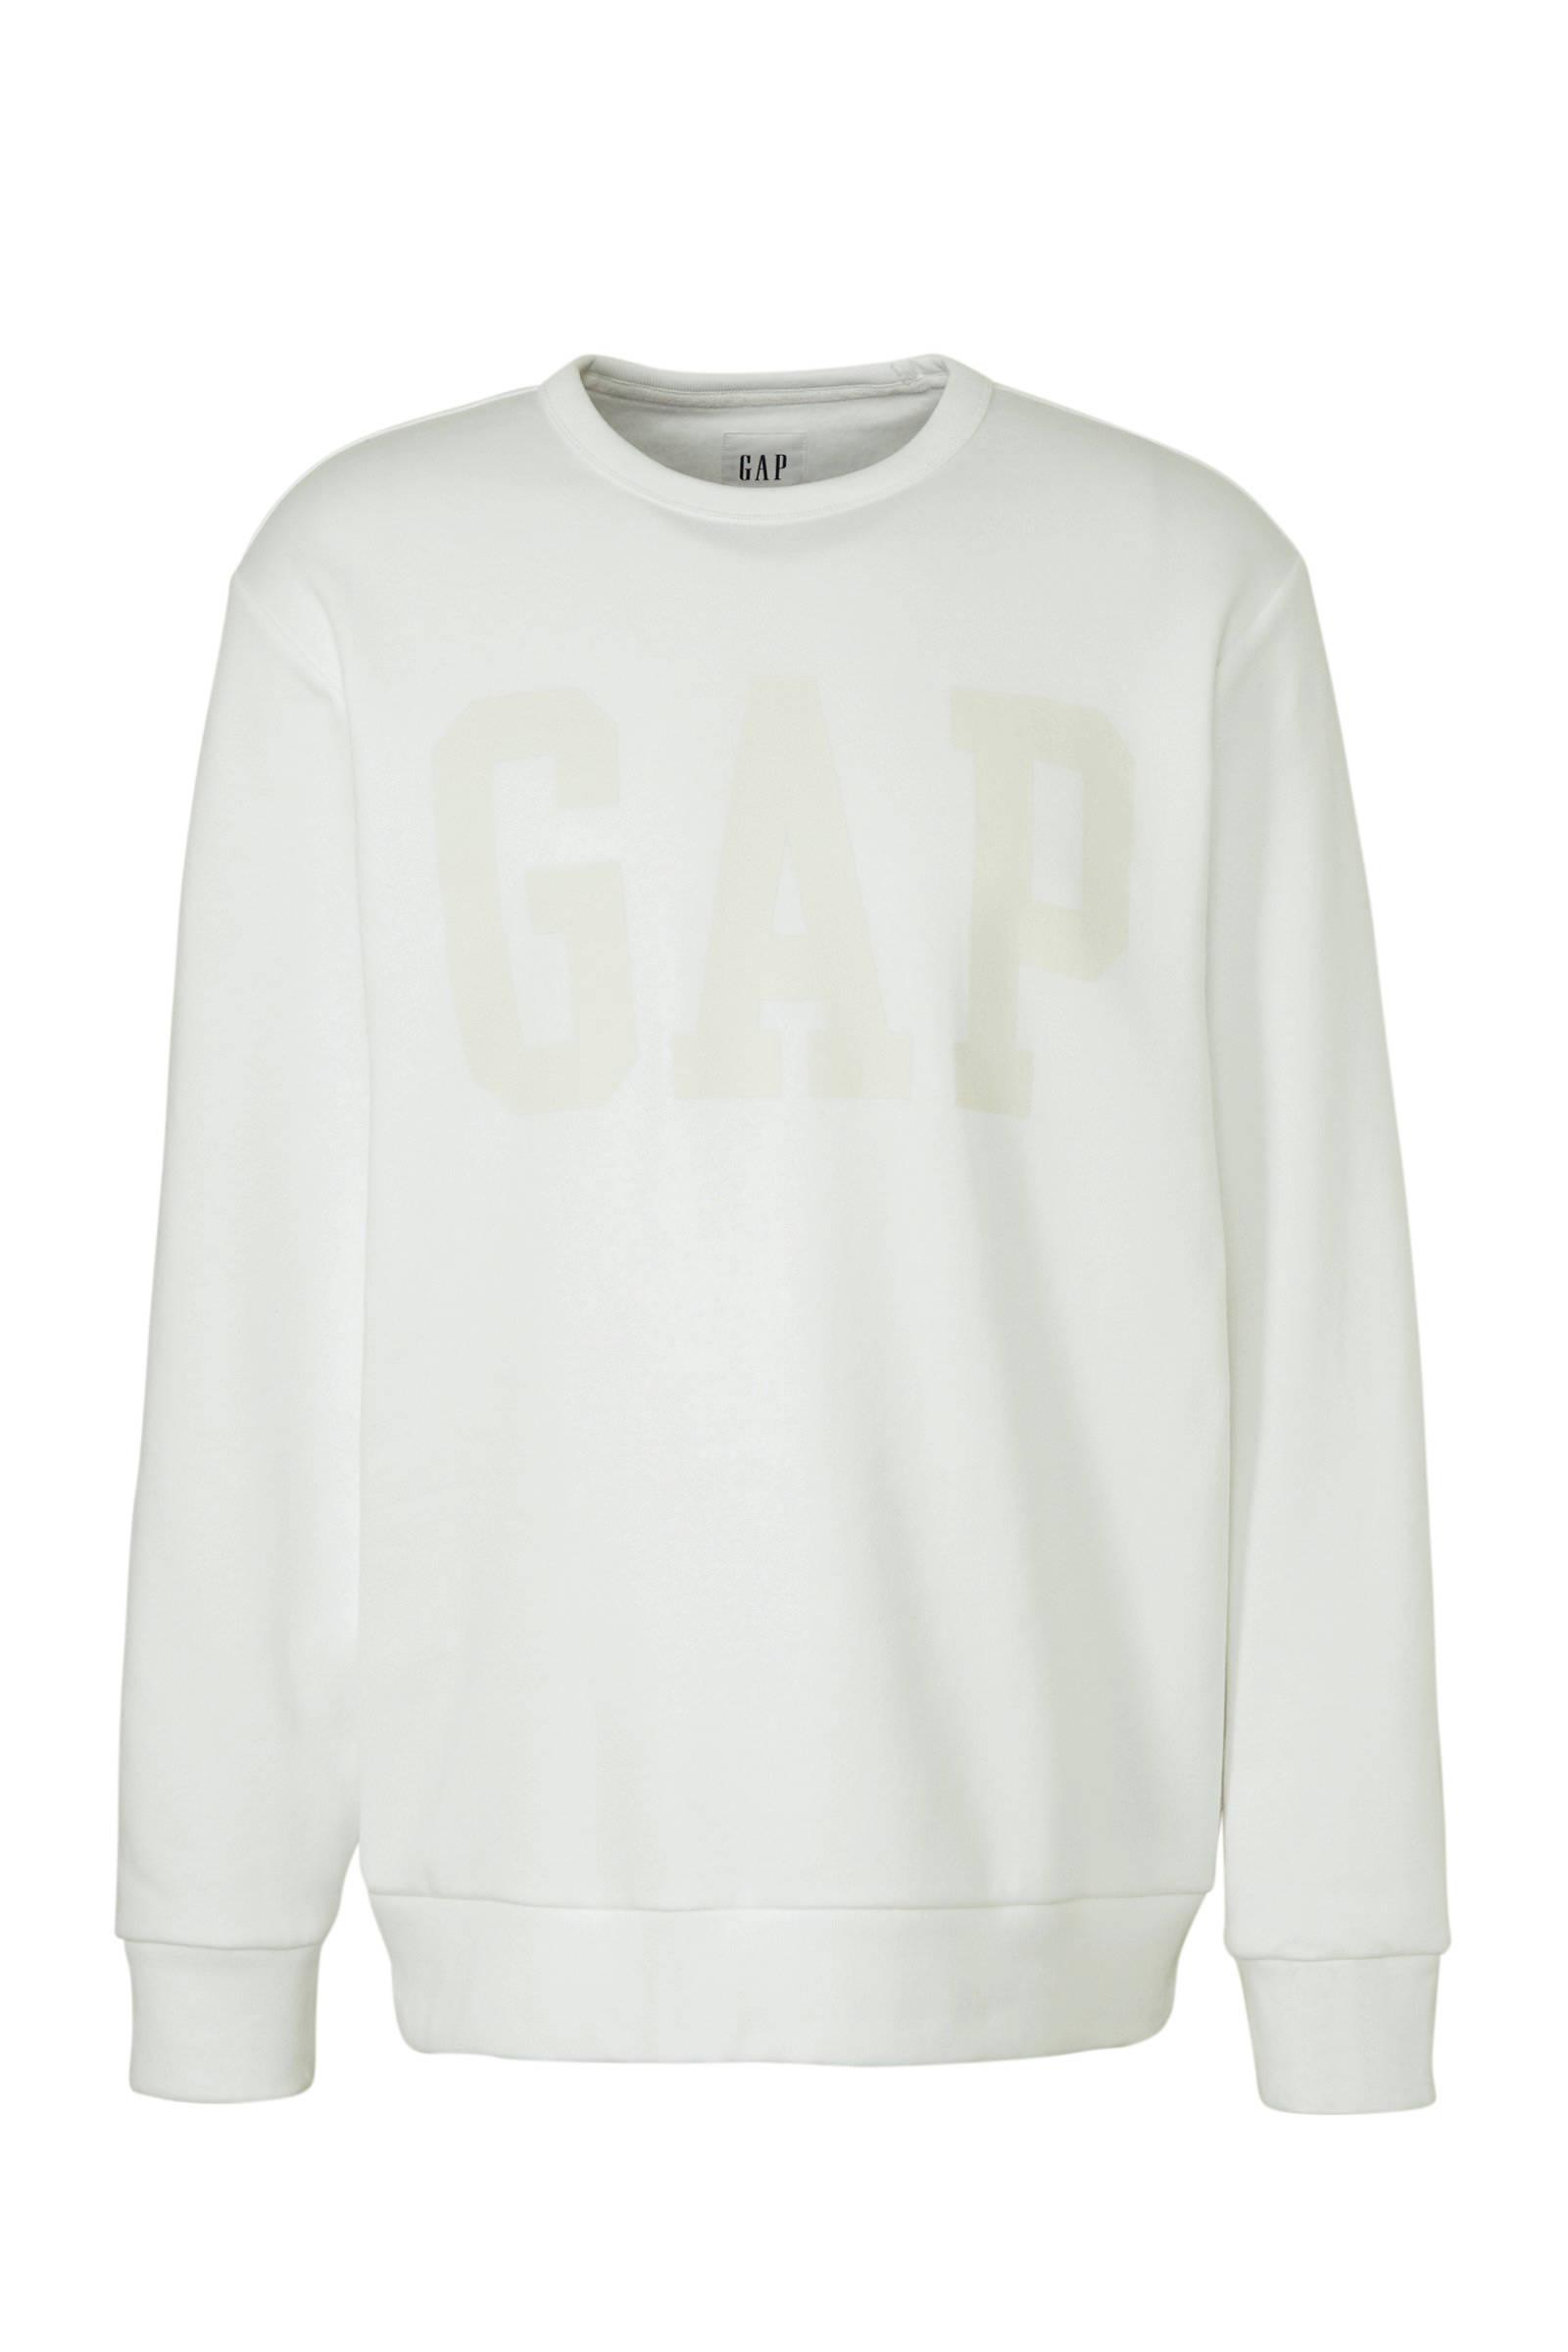 GAP sweater met printopdruk wit | wehkamp